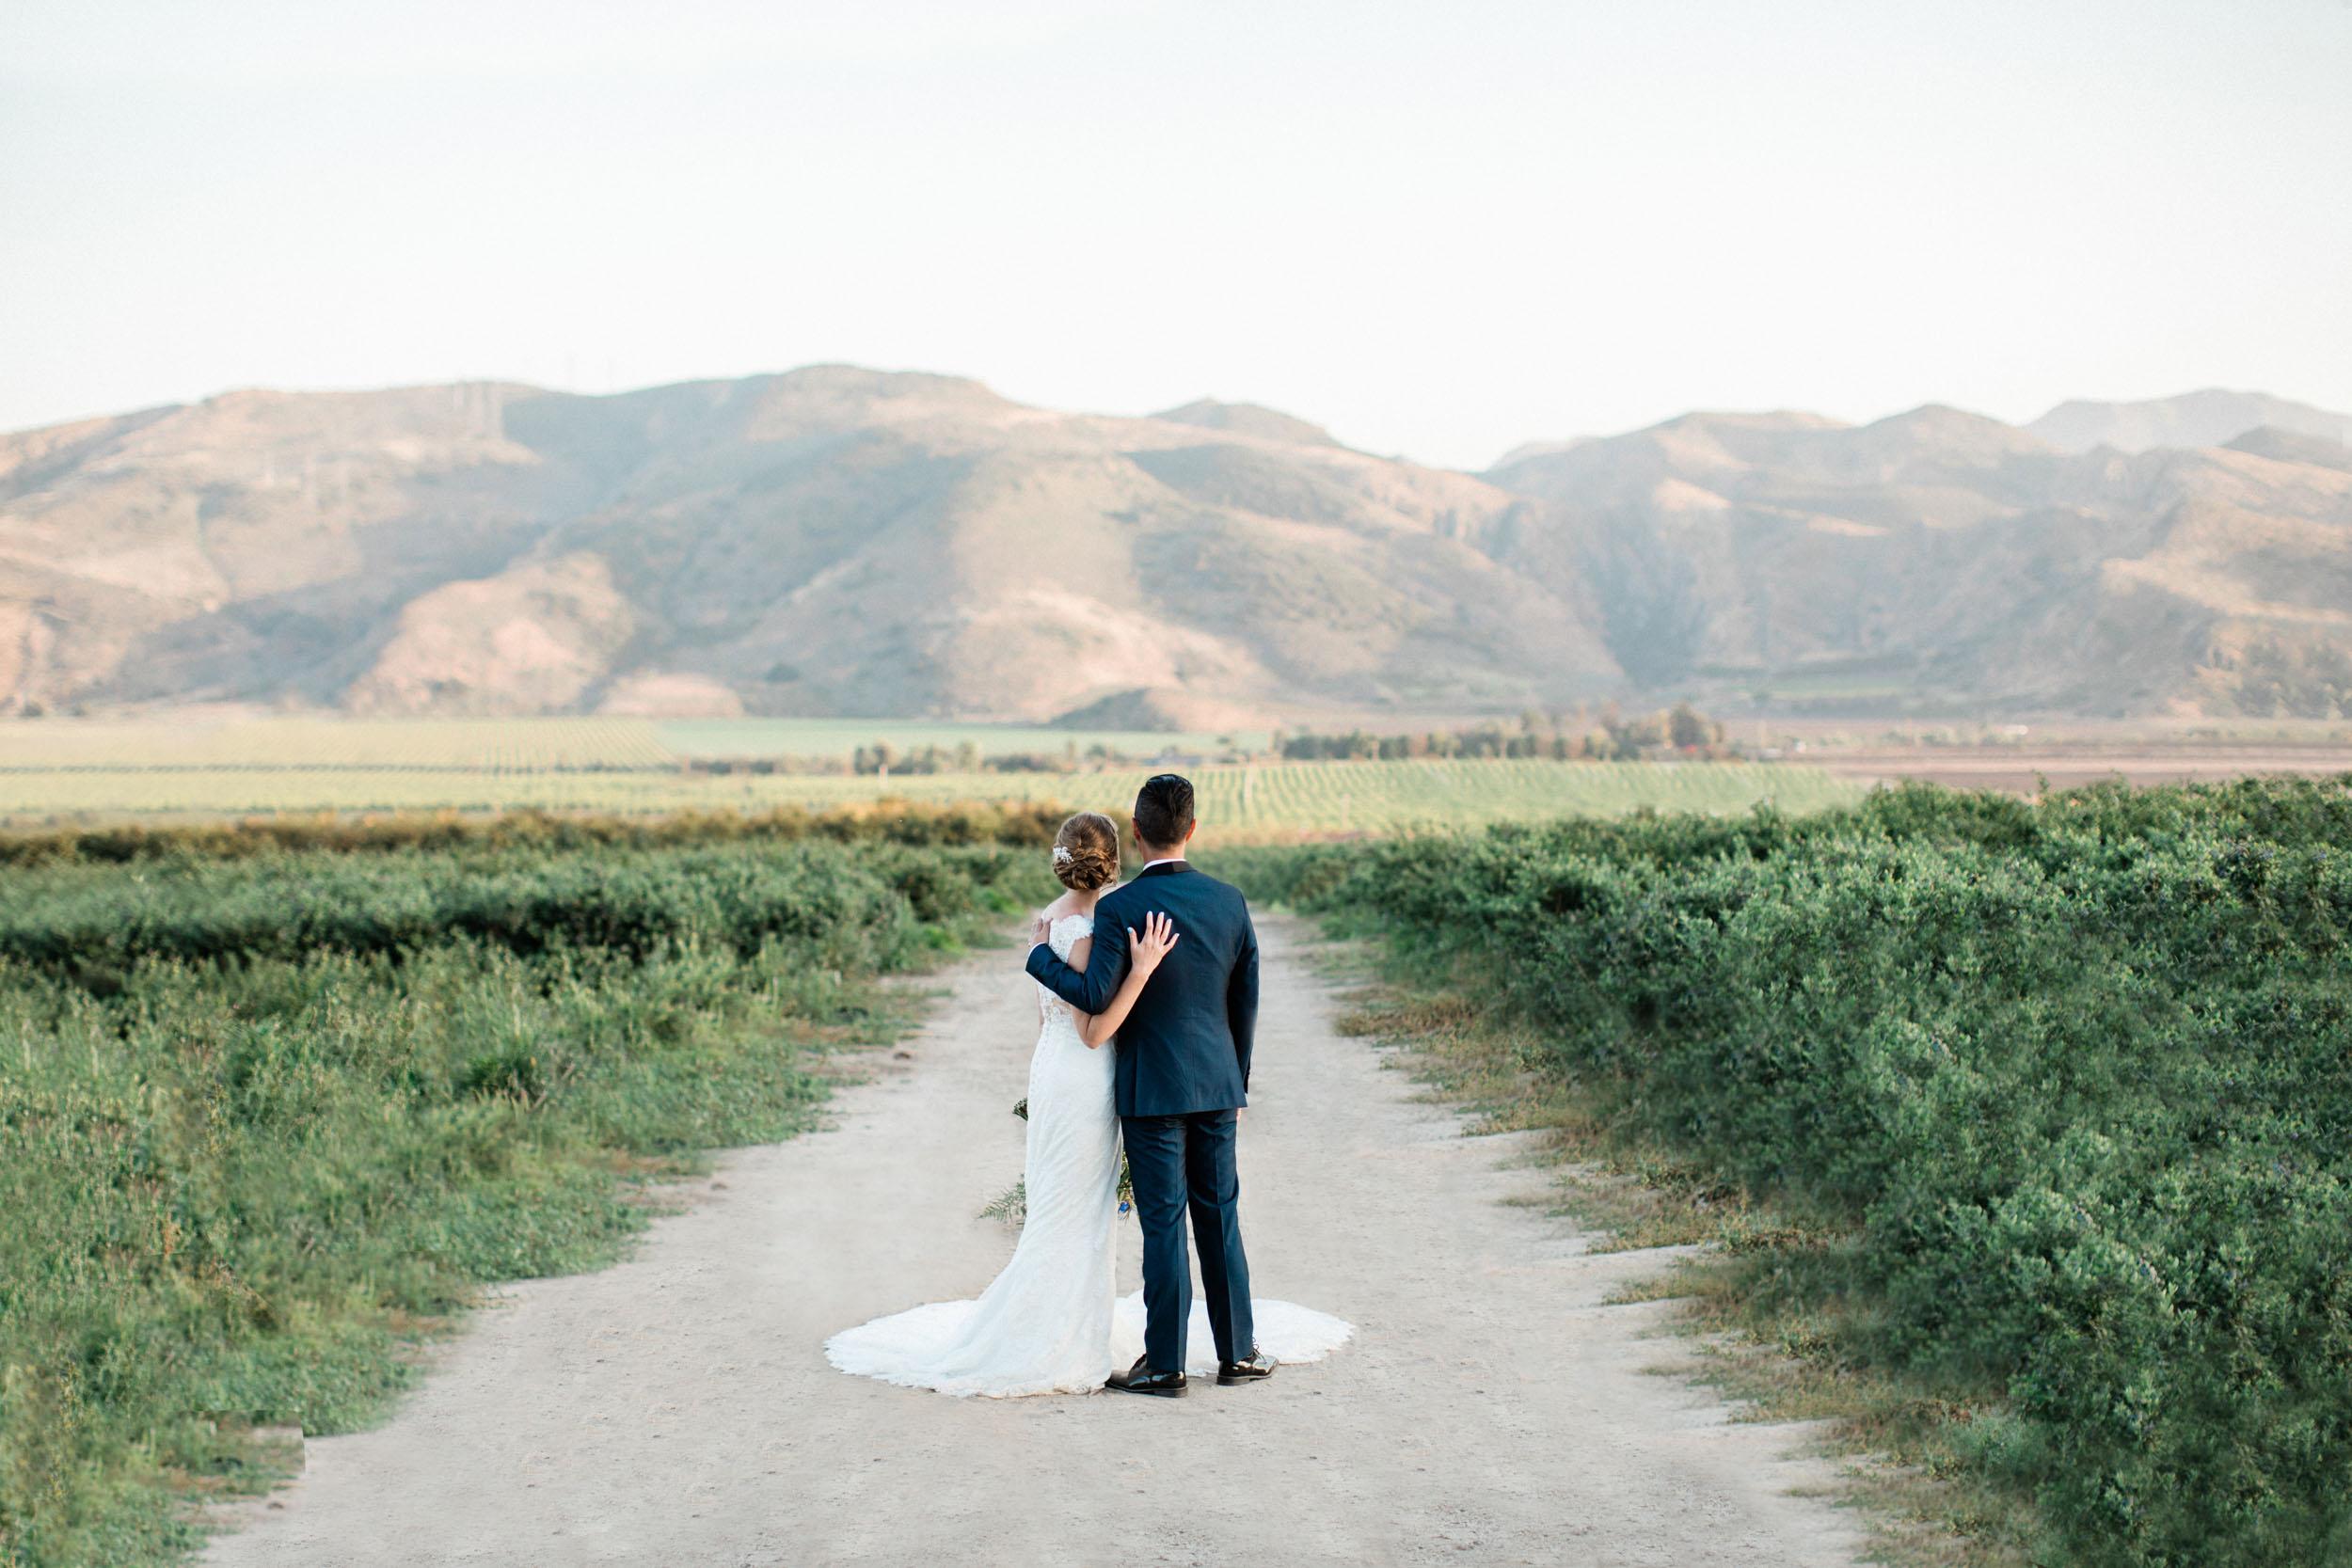 BKM-Photography-Gerry-Ranch-Southern-California-Wedding-0098.jpg-0001.jpg